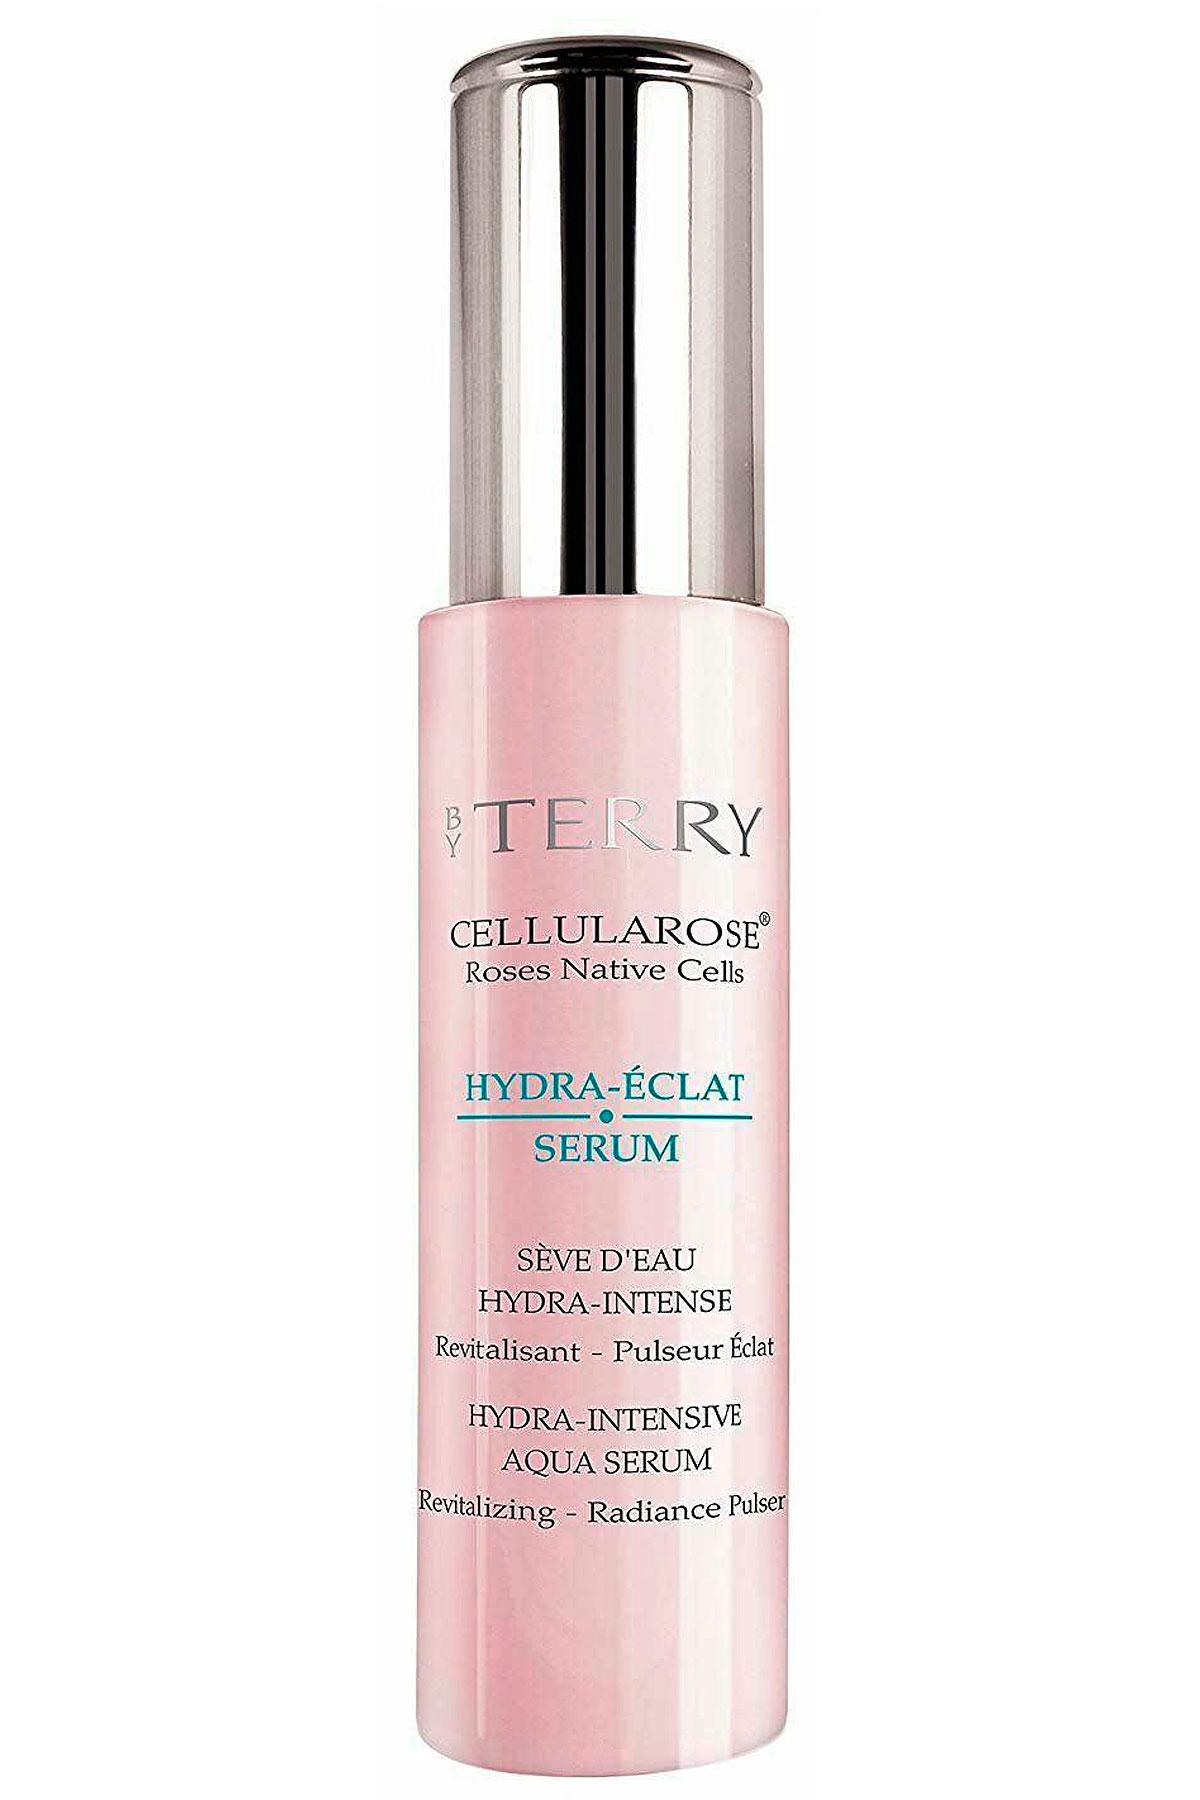 By Terry Beauty for Women, Hydra Eclat - Serum - 30 Ml, 2019, 30 ml